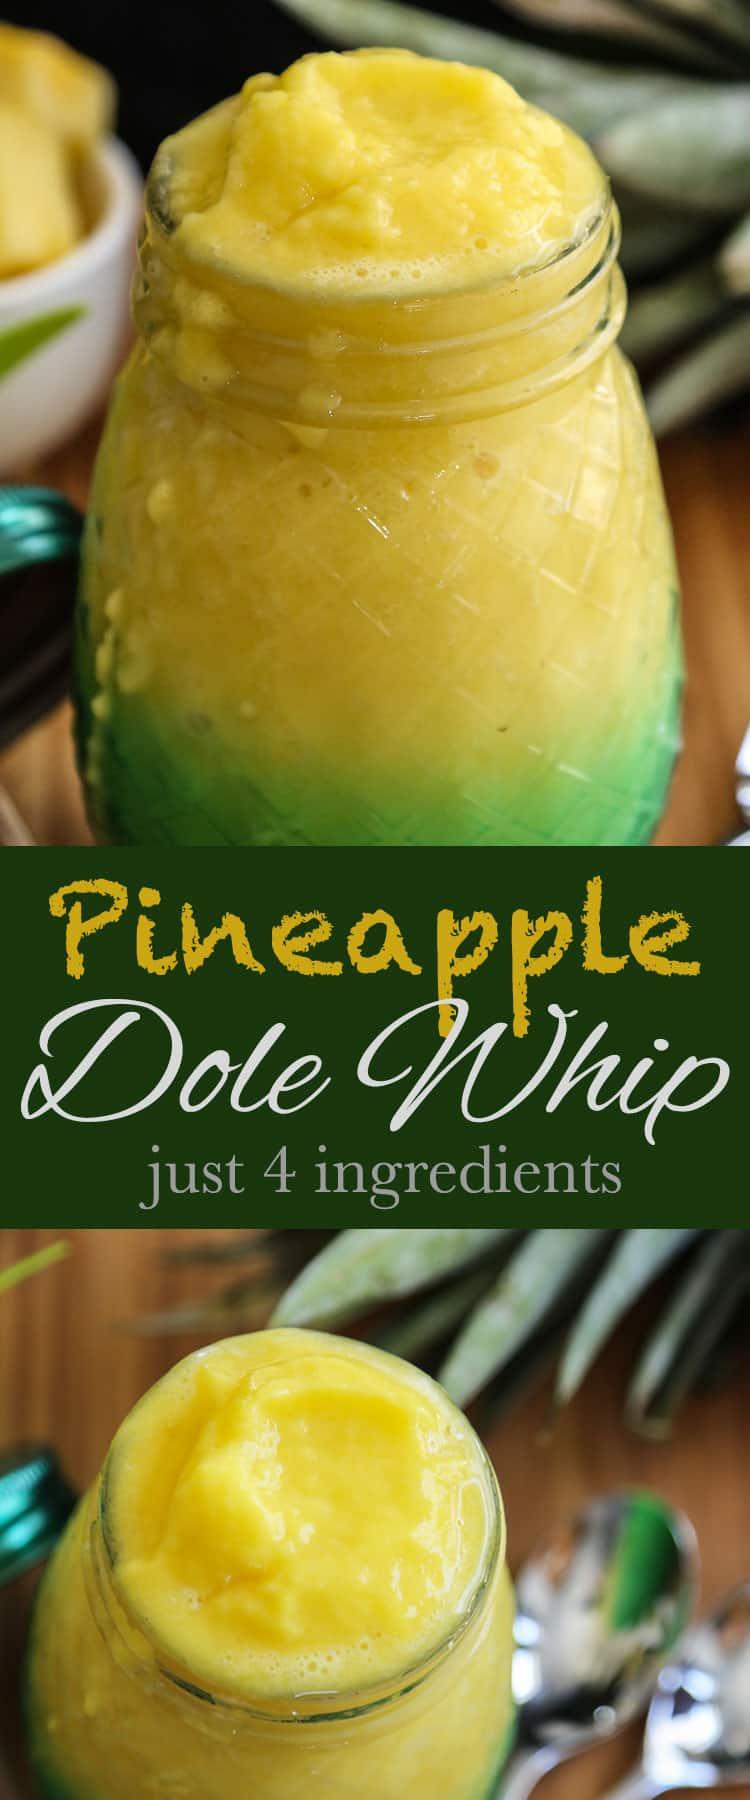 Homemade Pineapple Dole Whip